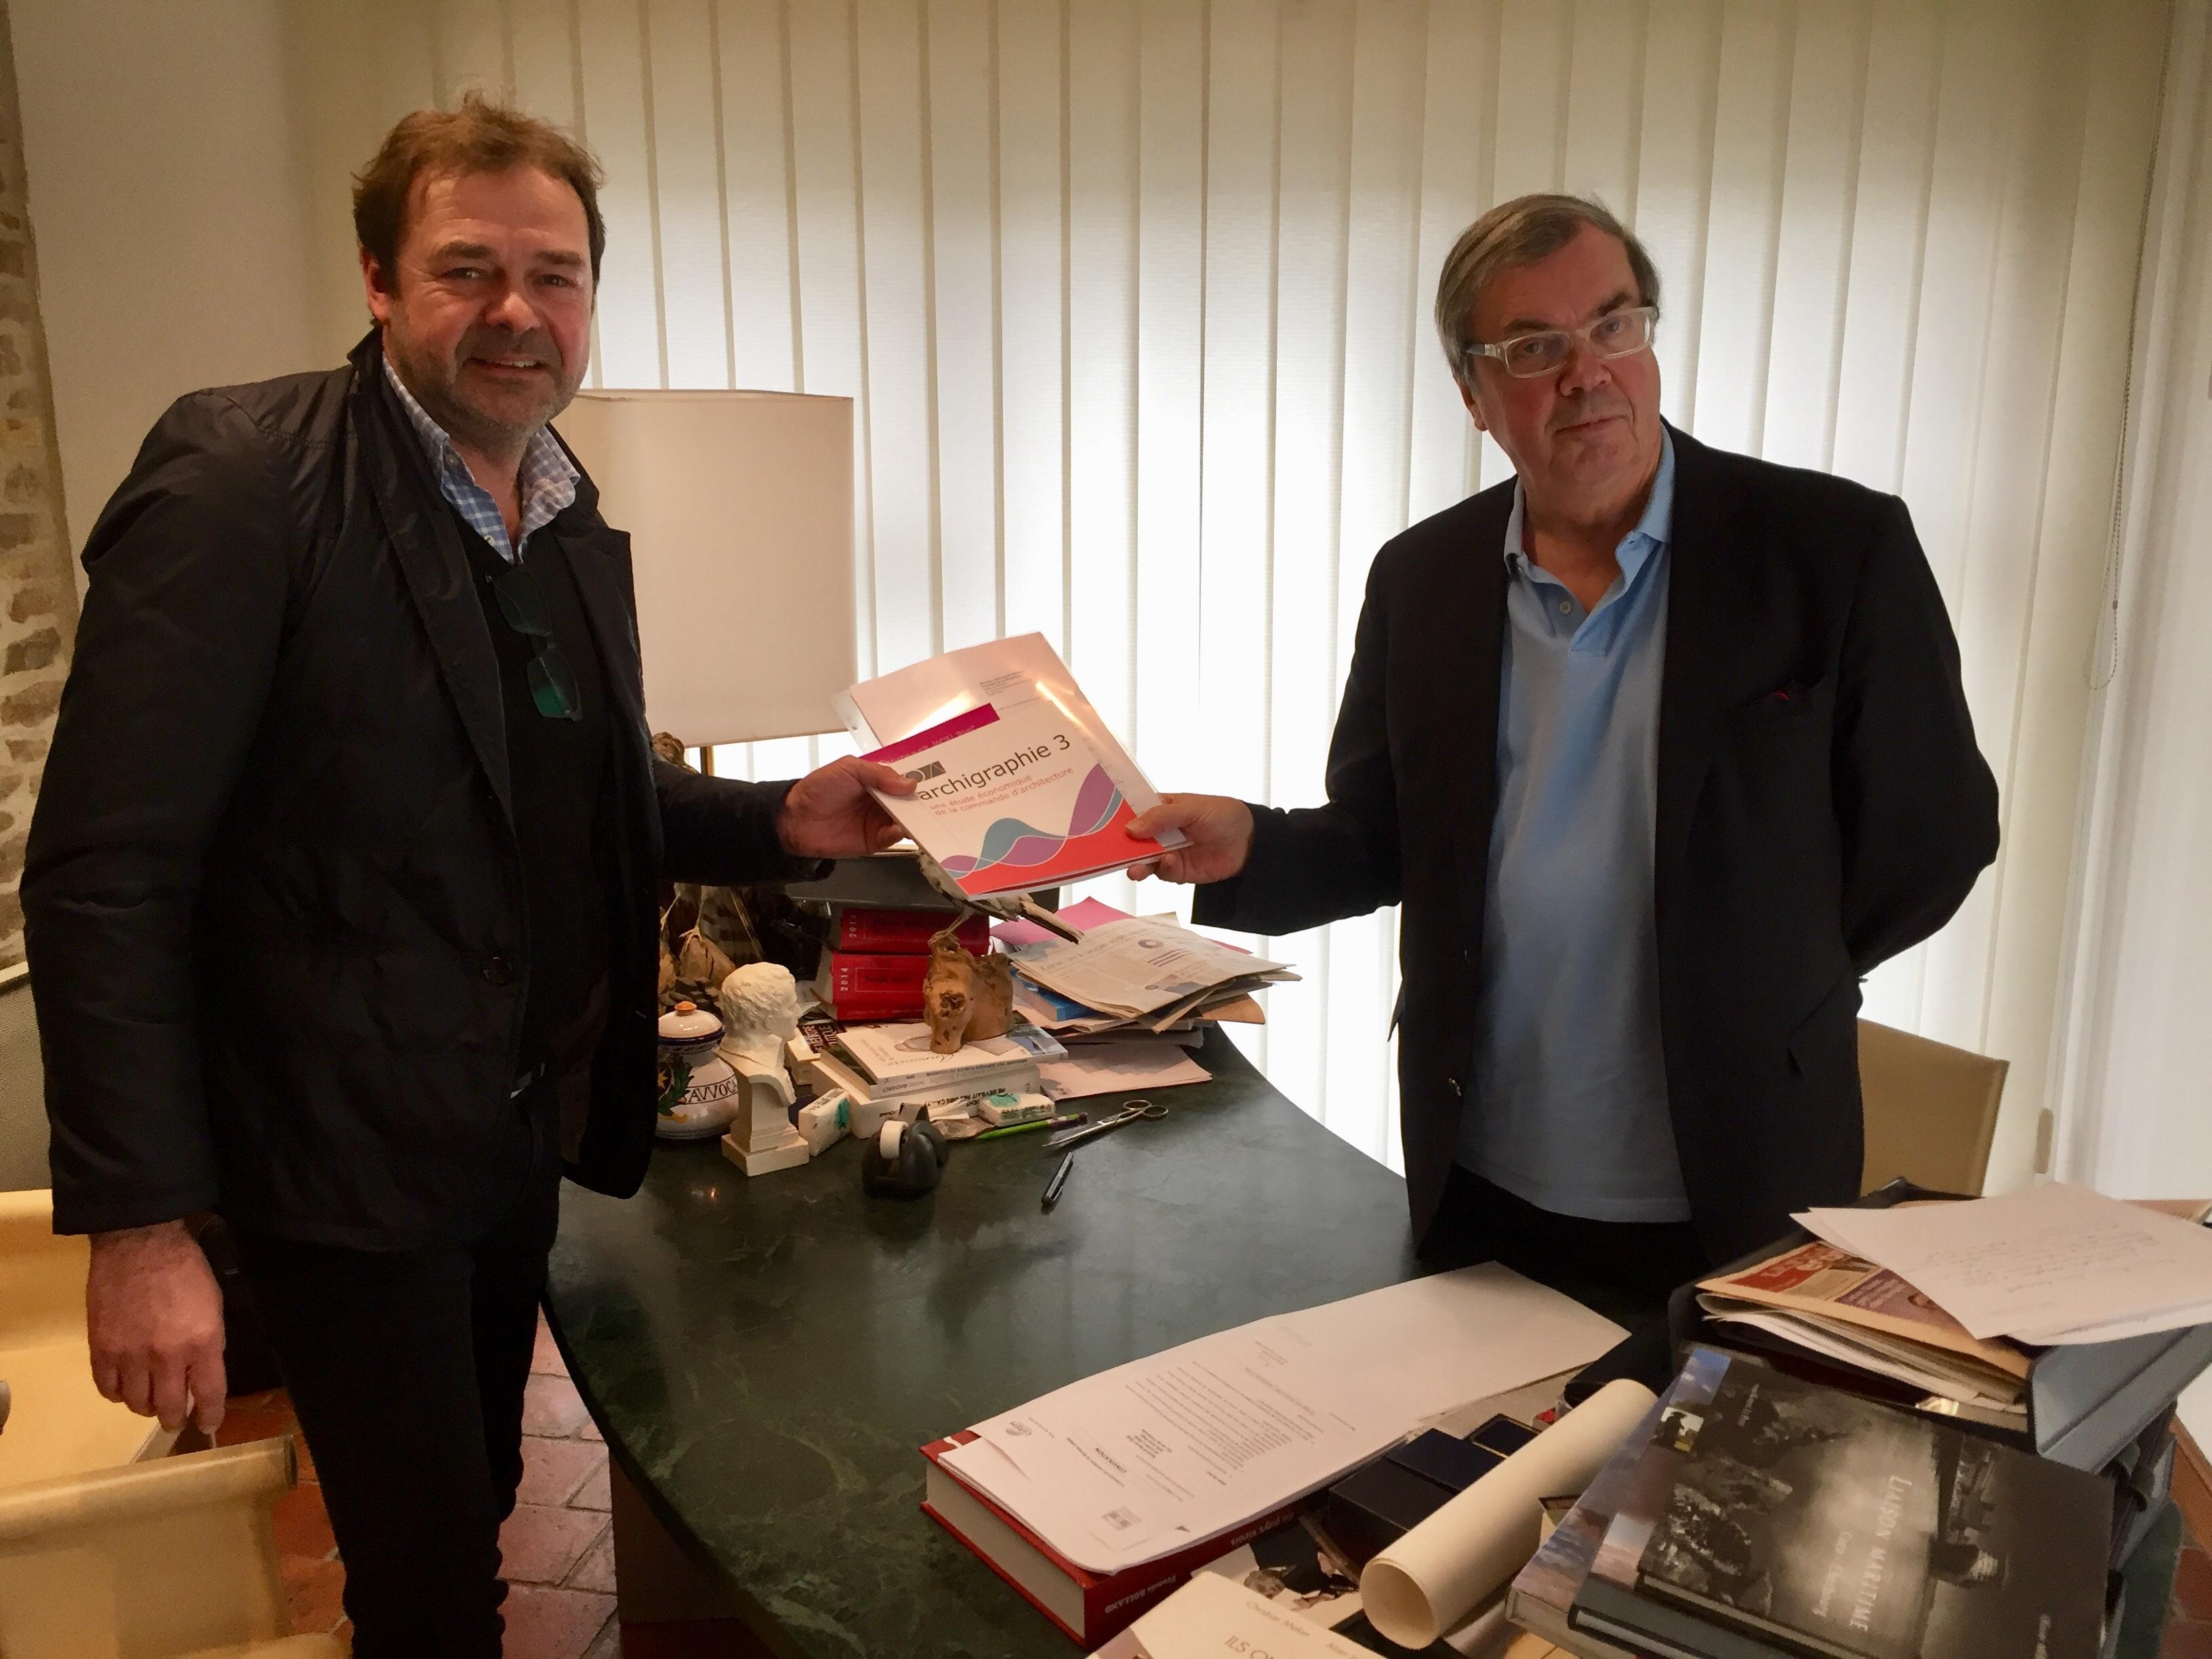 Stéphane Bossuyt et Alain Tourret